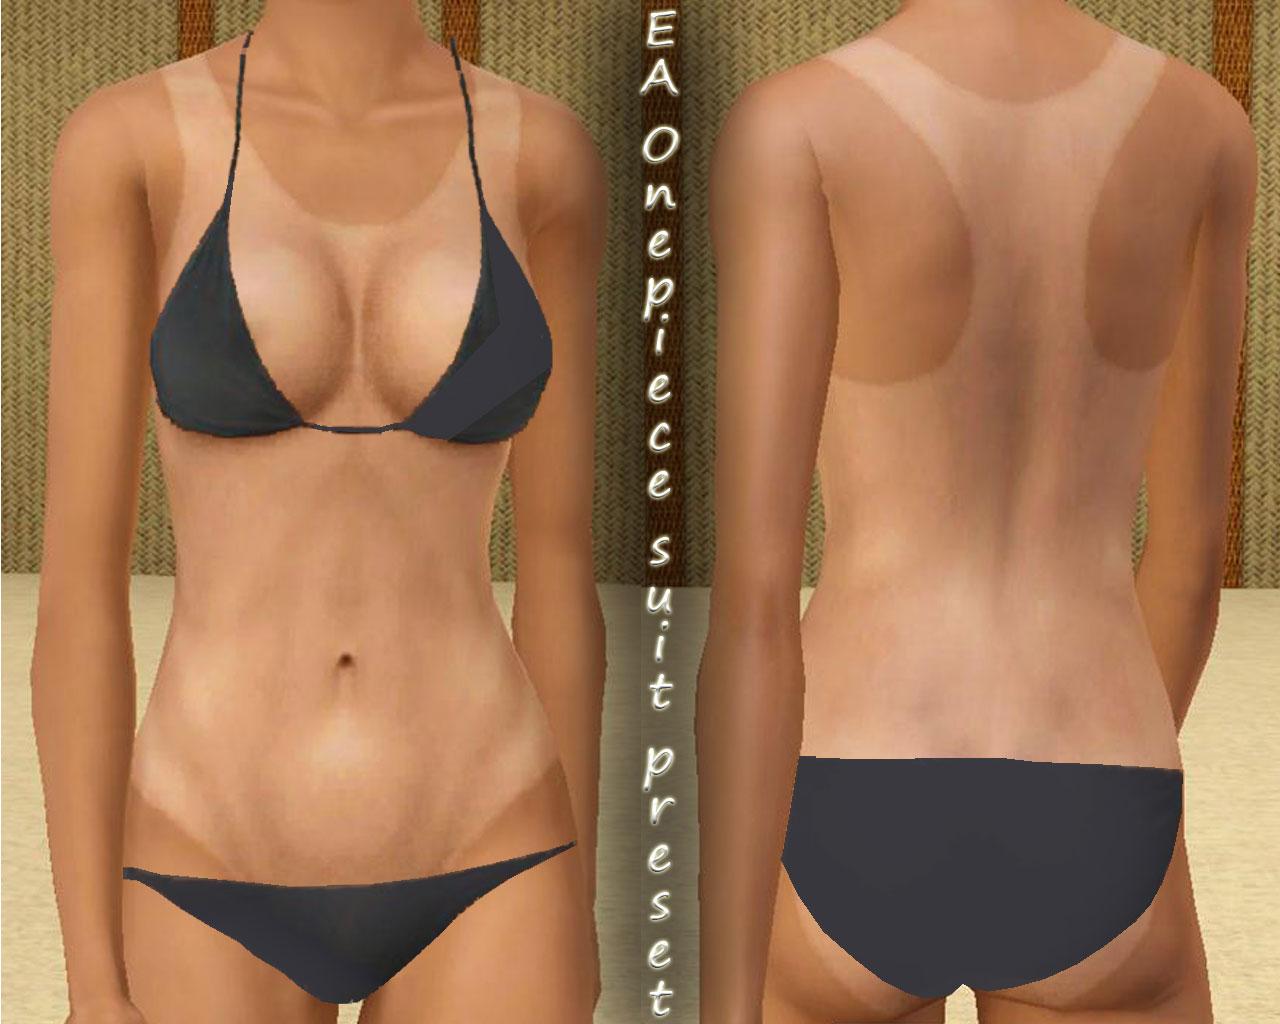 Bikini tan line photos commit error